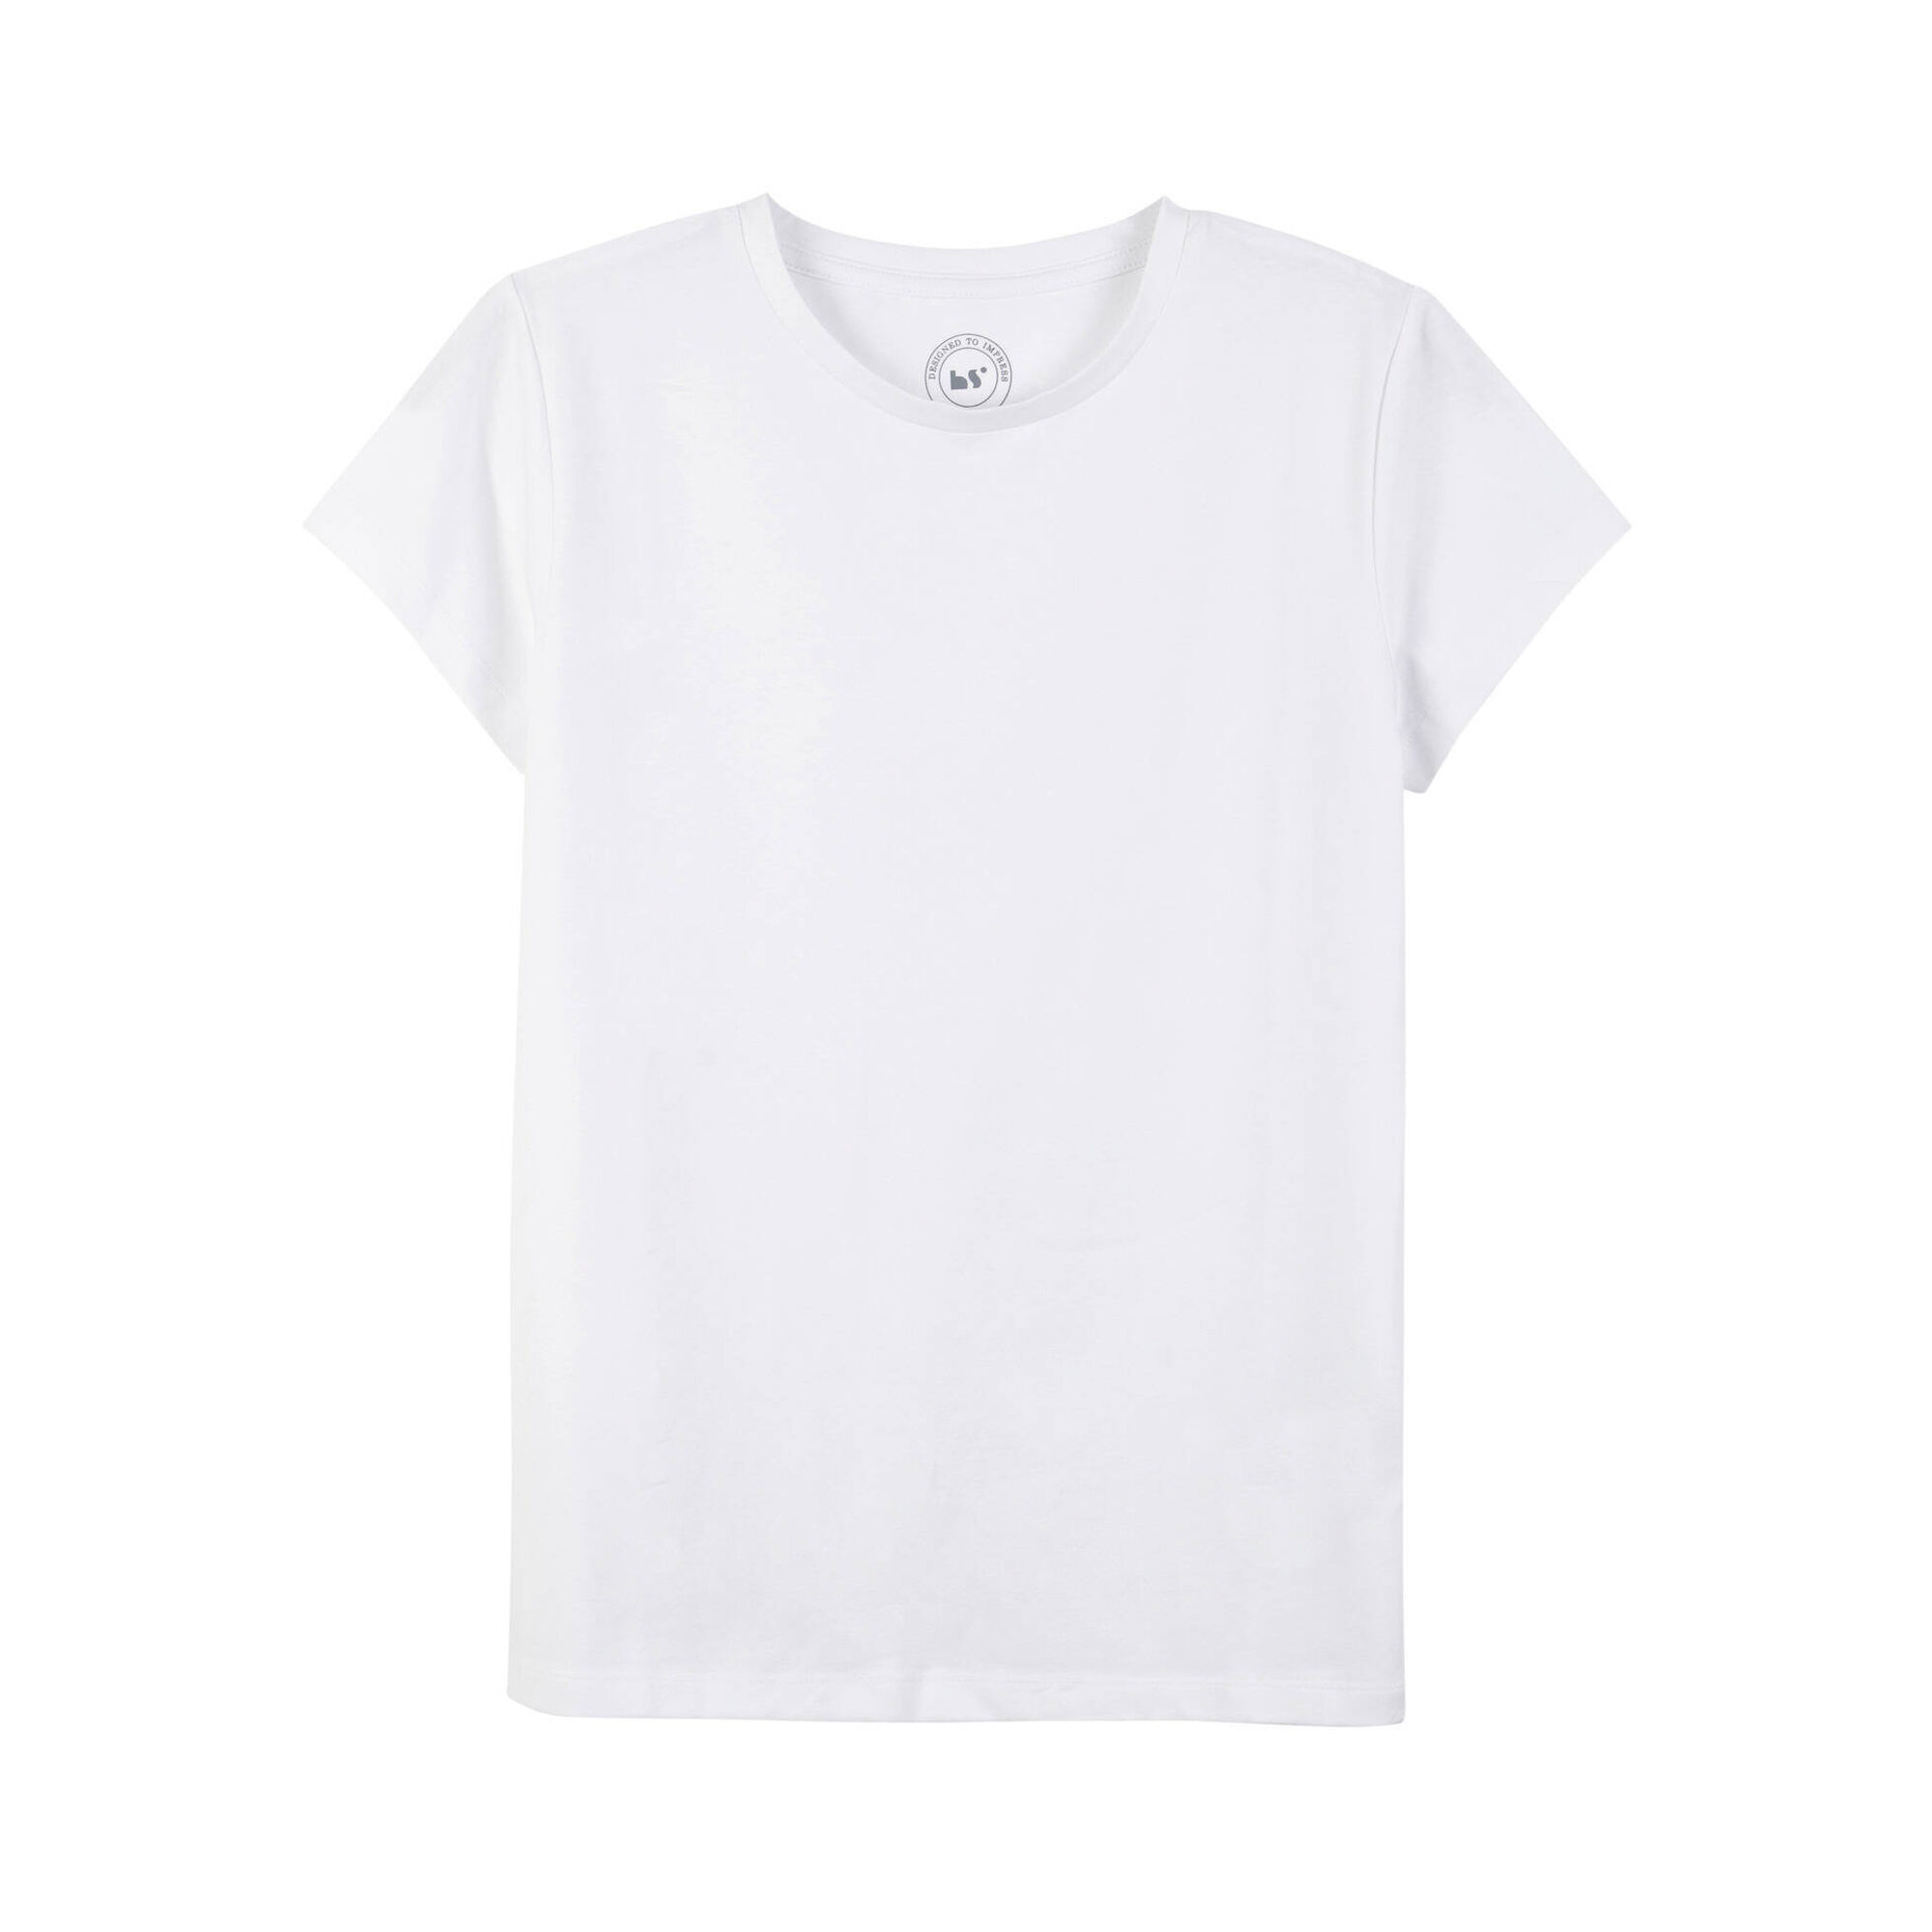 T-shirt XXL Branco